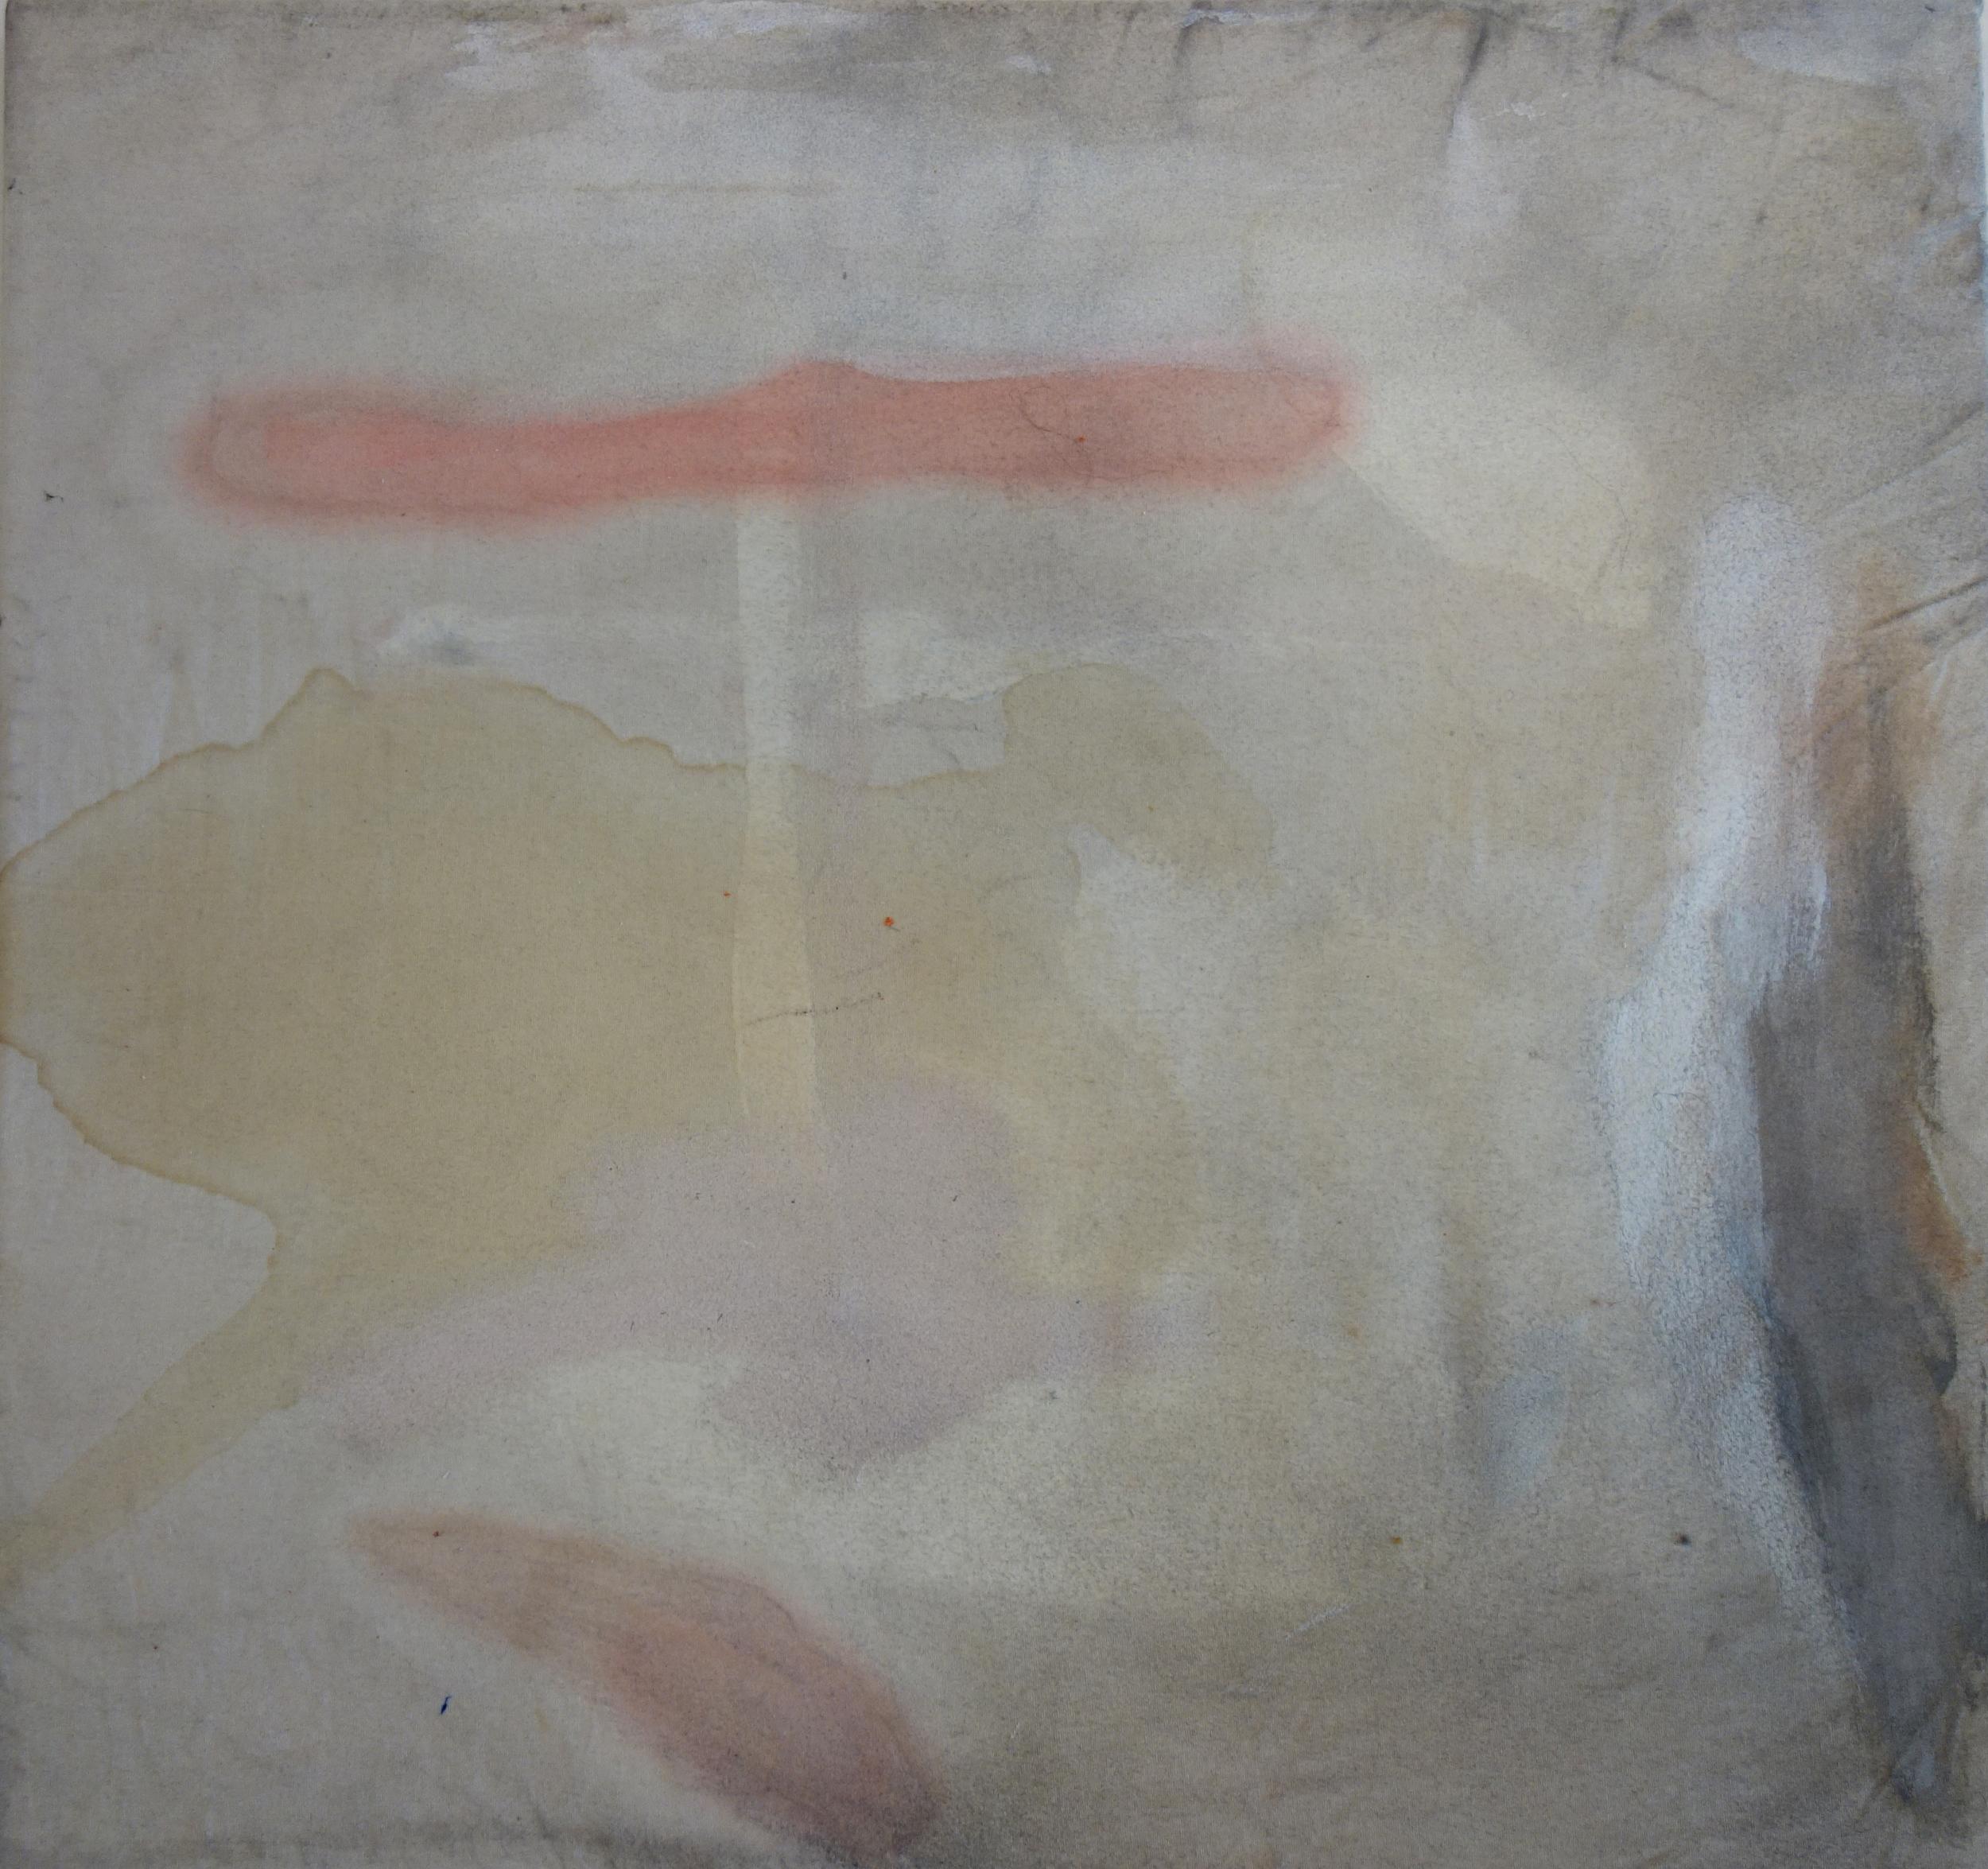 Ariel Baldwin